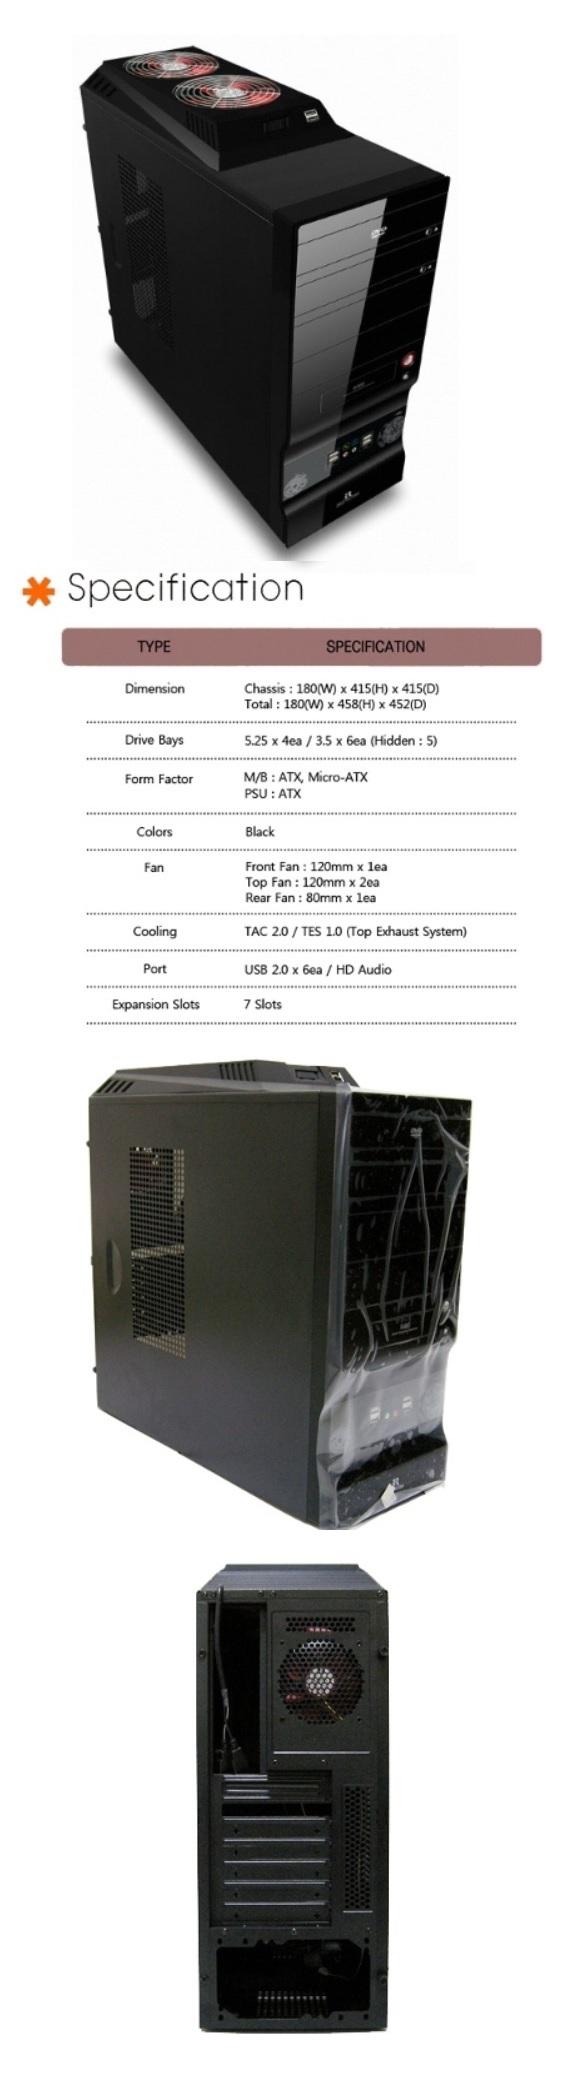 3RSystem R460 에스프레소.jpg